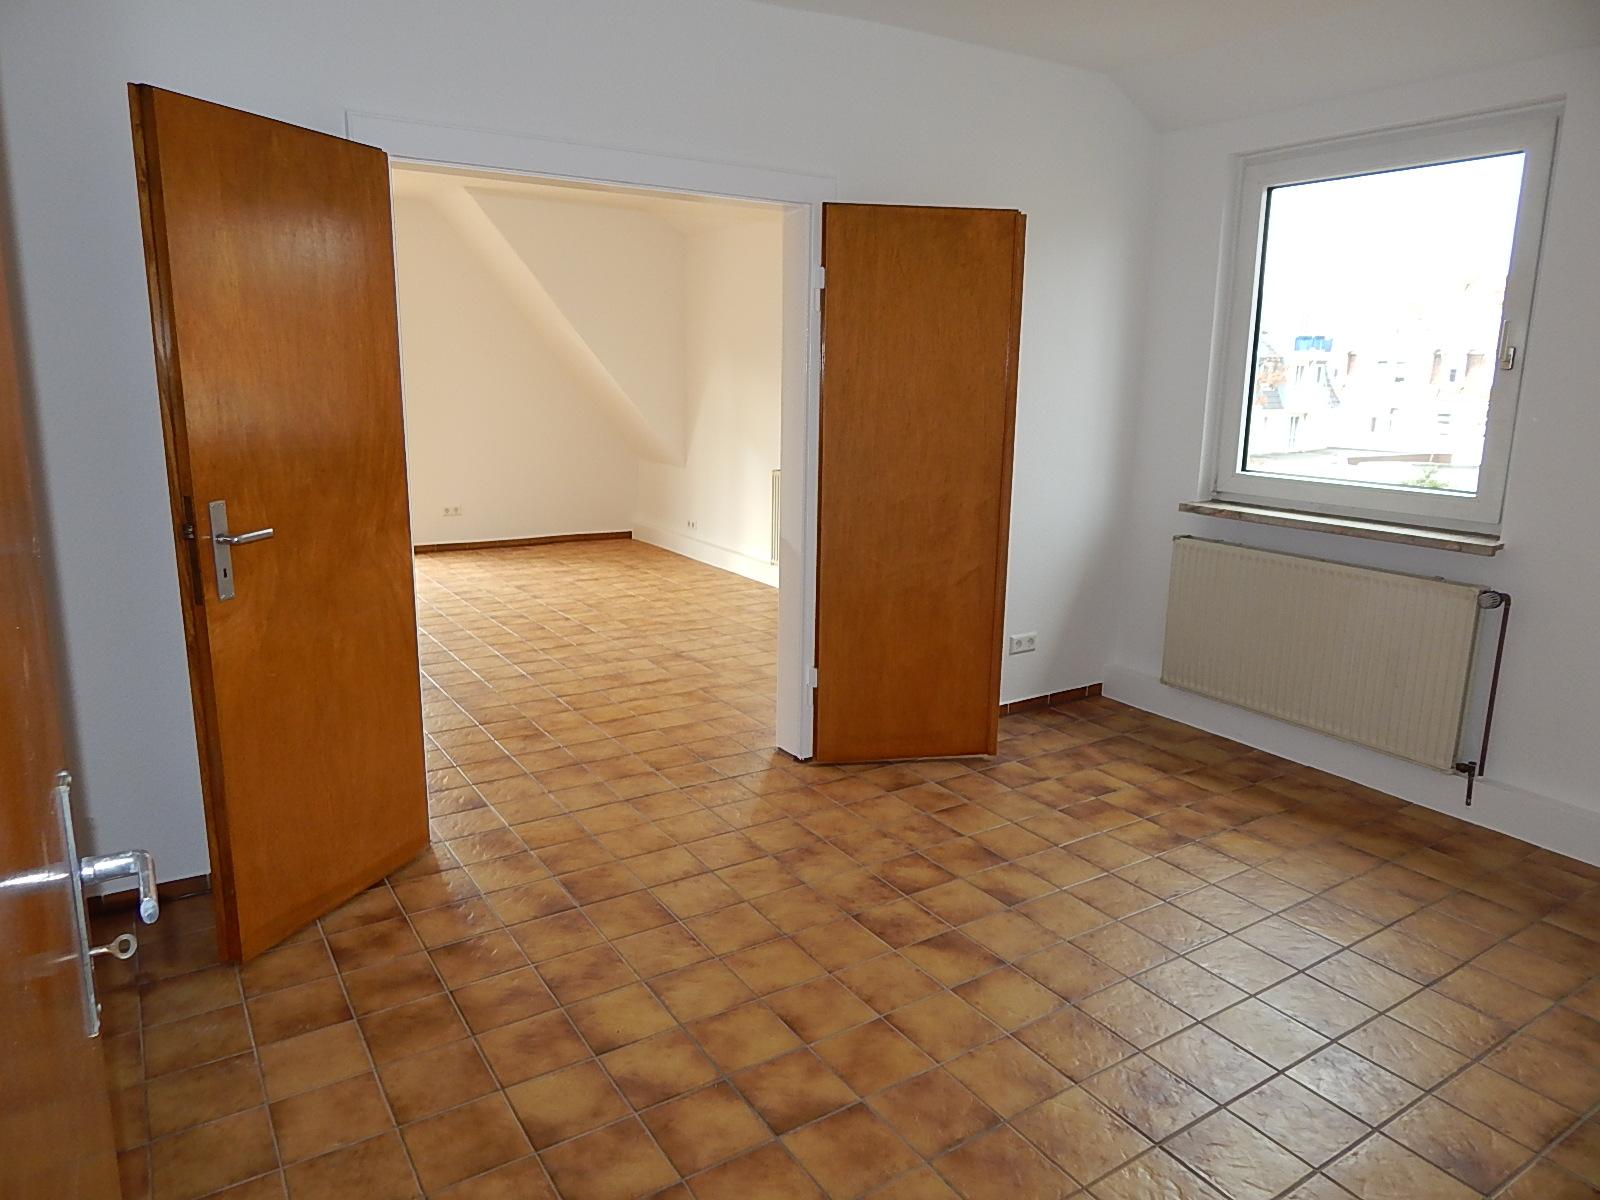 dachgeschosswohnung in g ttingen thomas hoffmann immobilienthomas hoffmann immobilien. Black Bedroom Furniture Sets. Home Design Ideas